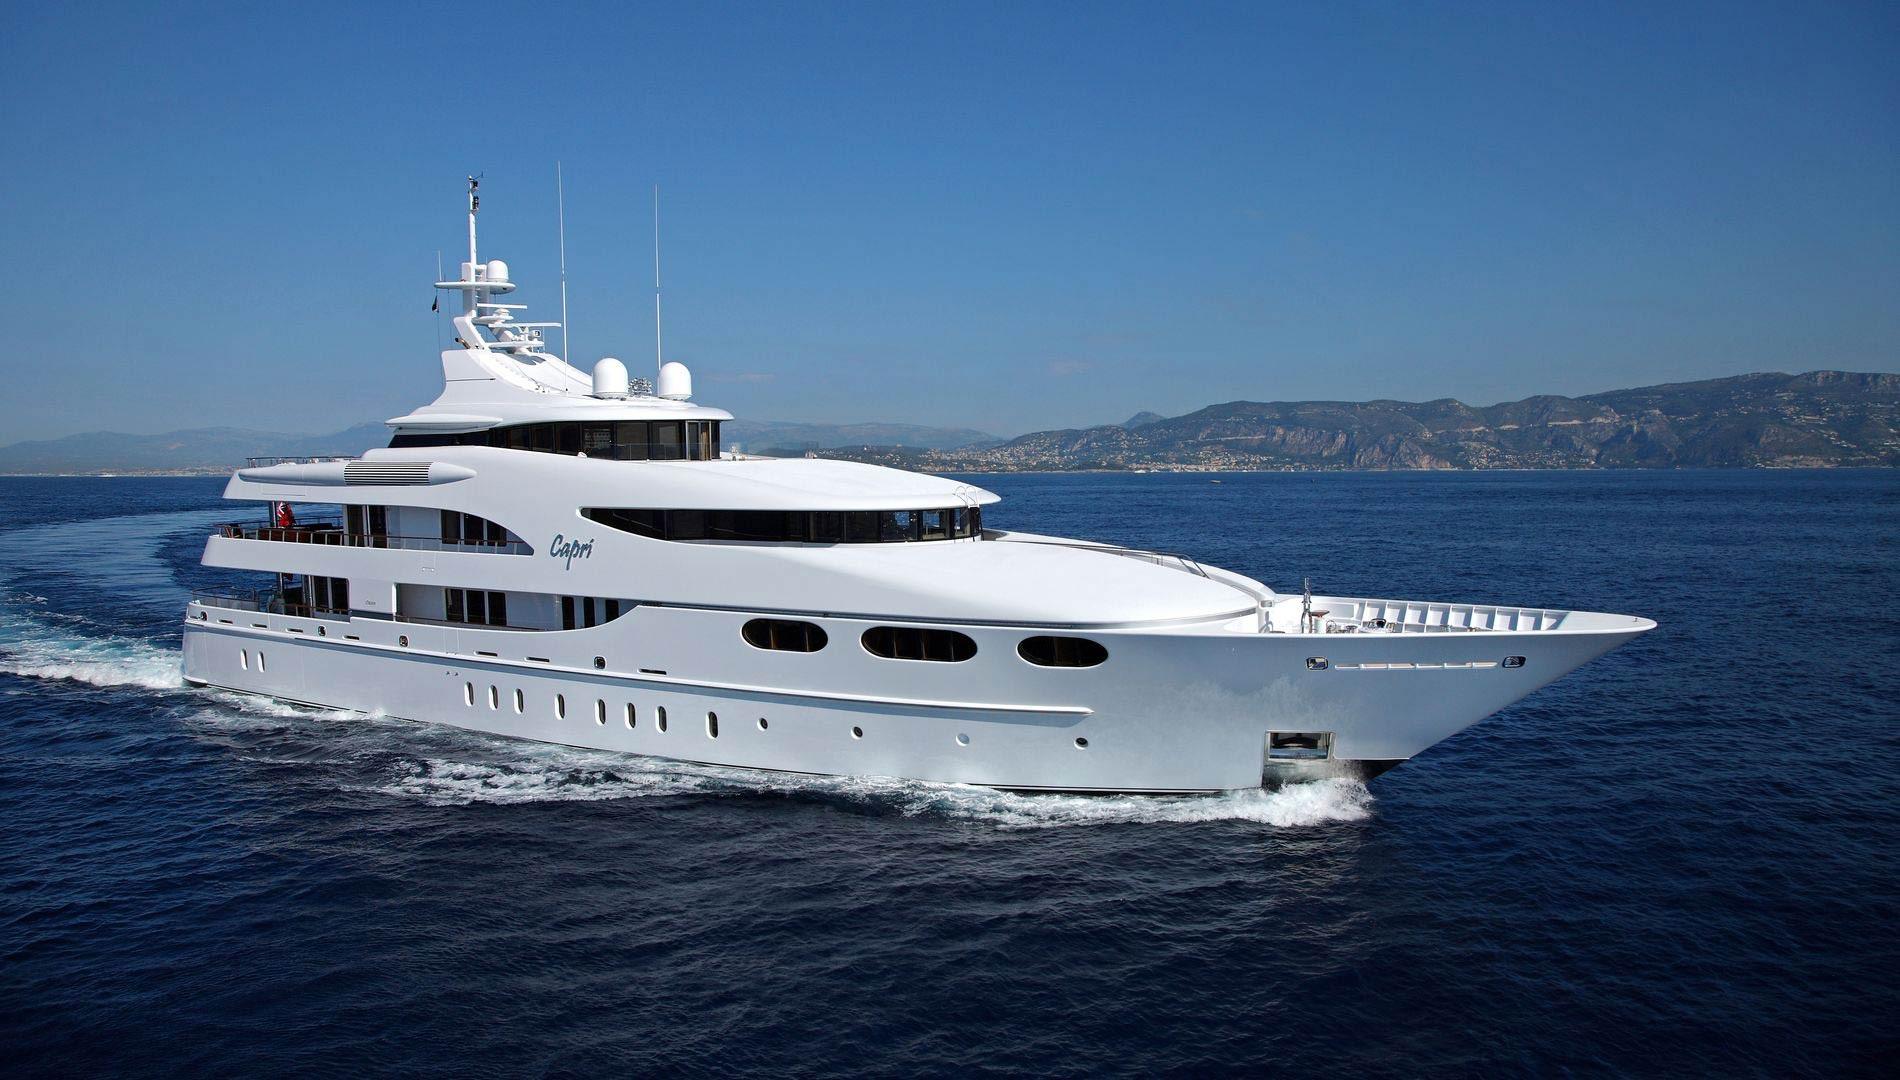 Yacht CAPRI By Lurssen - Underway In The French Riviera